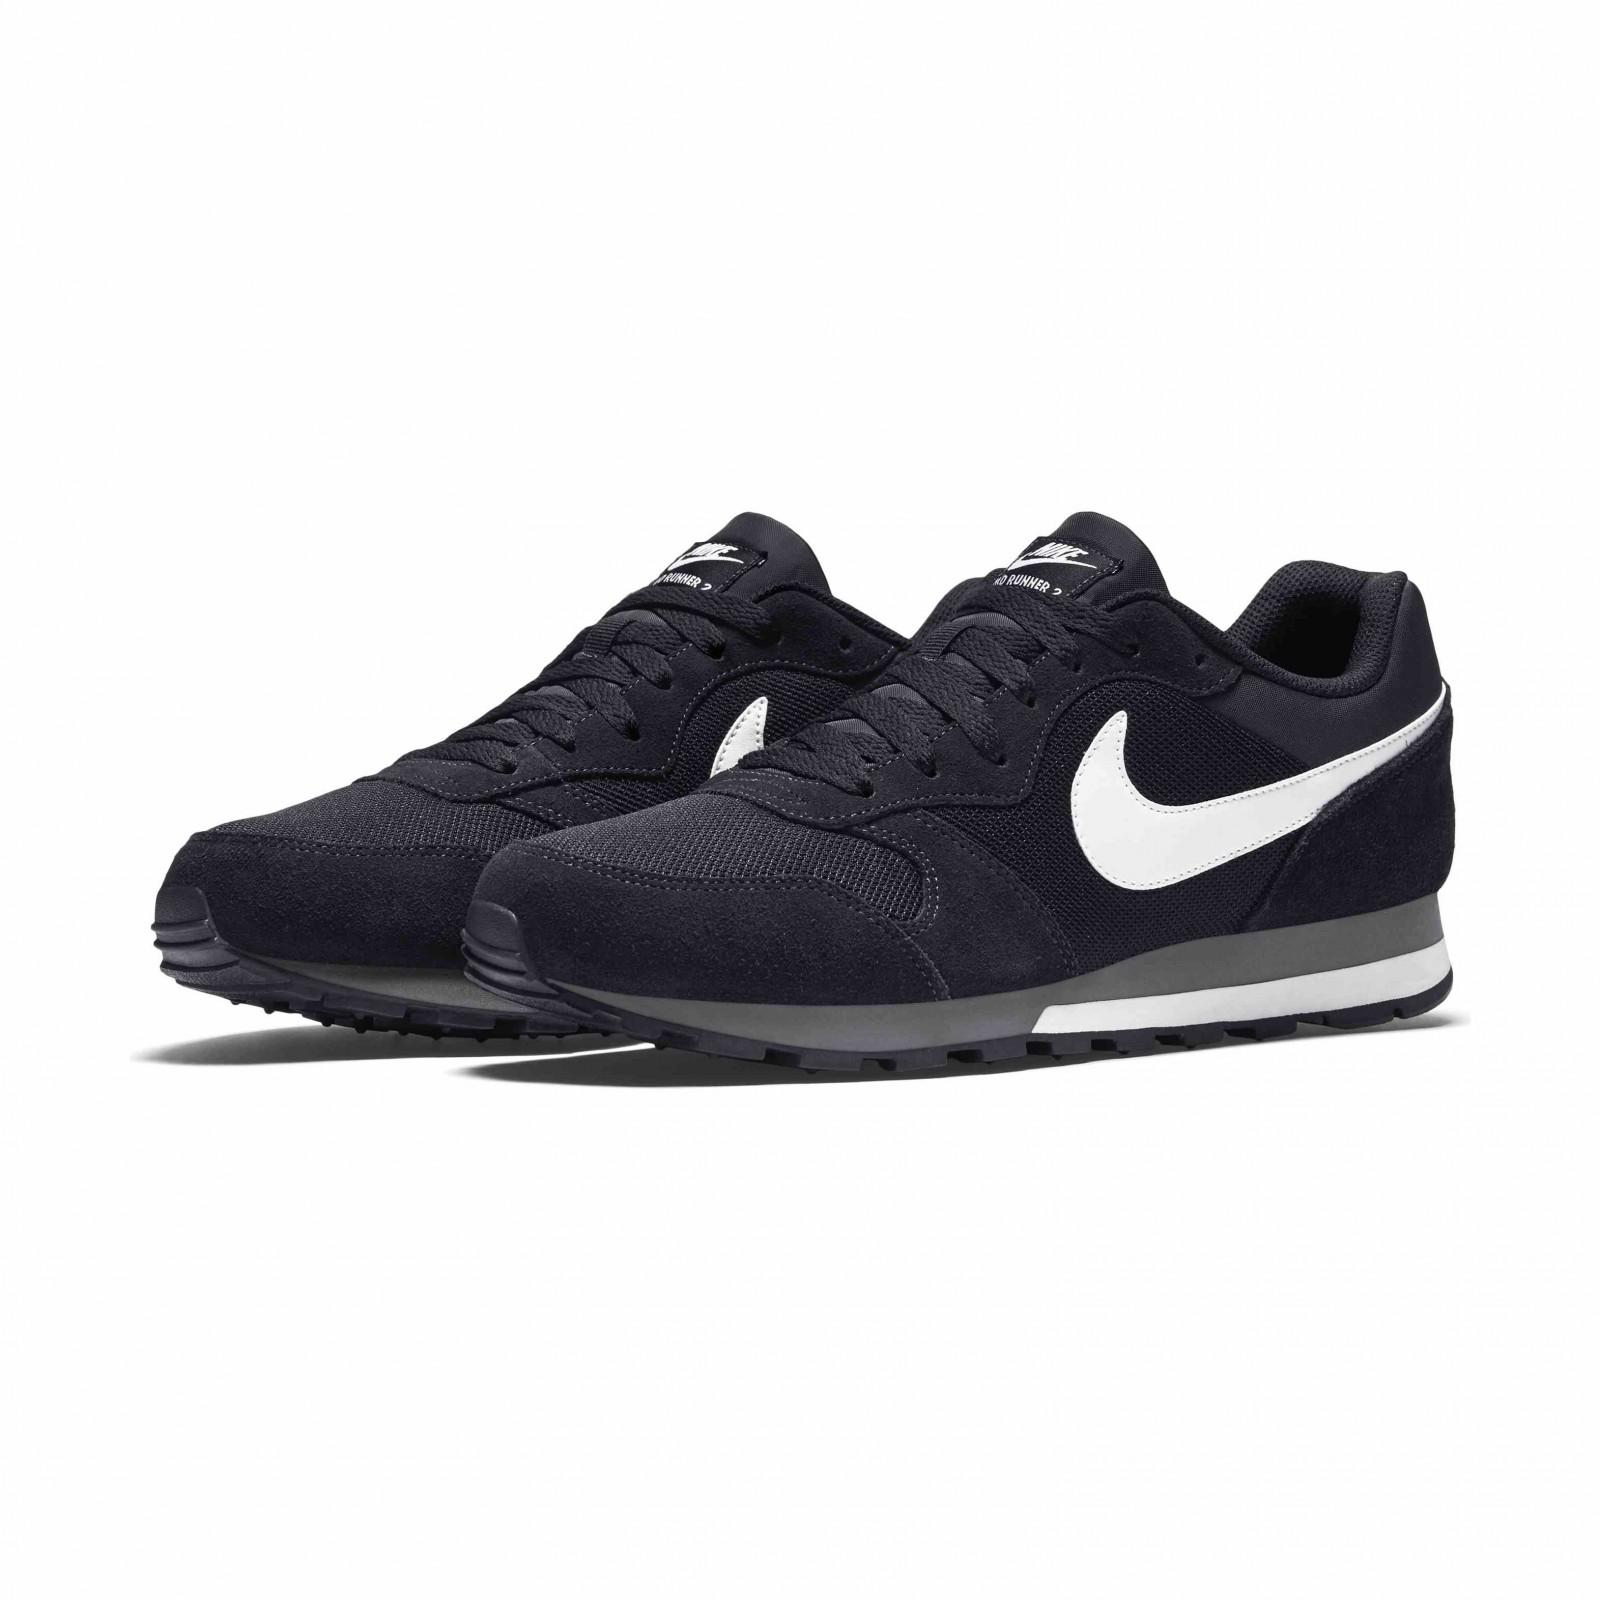 2b953ca0410c Pánské tenisky Nike MD RUNNER 2